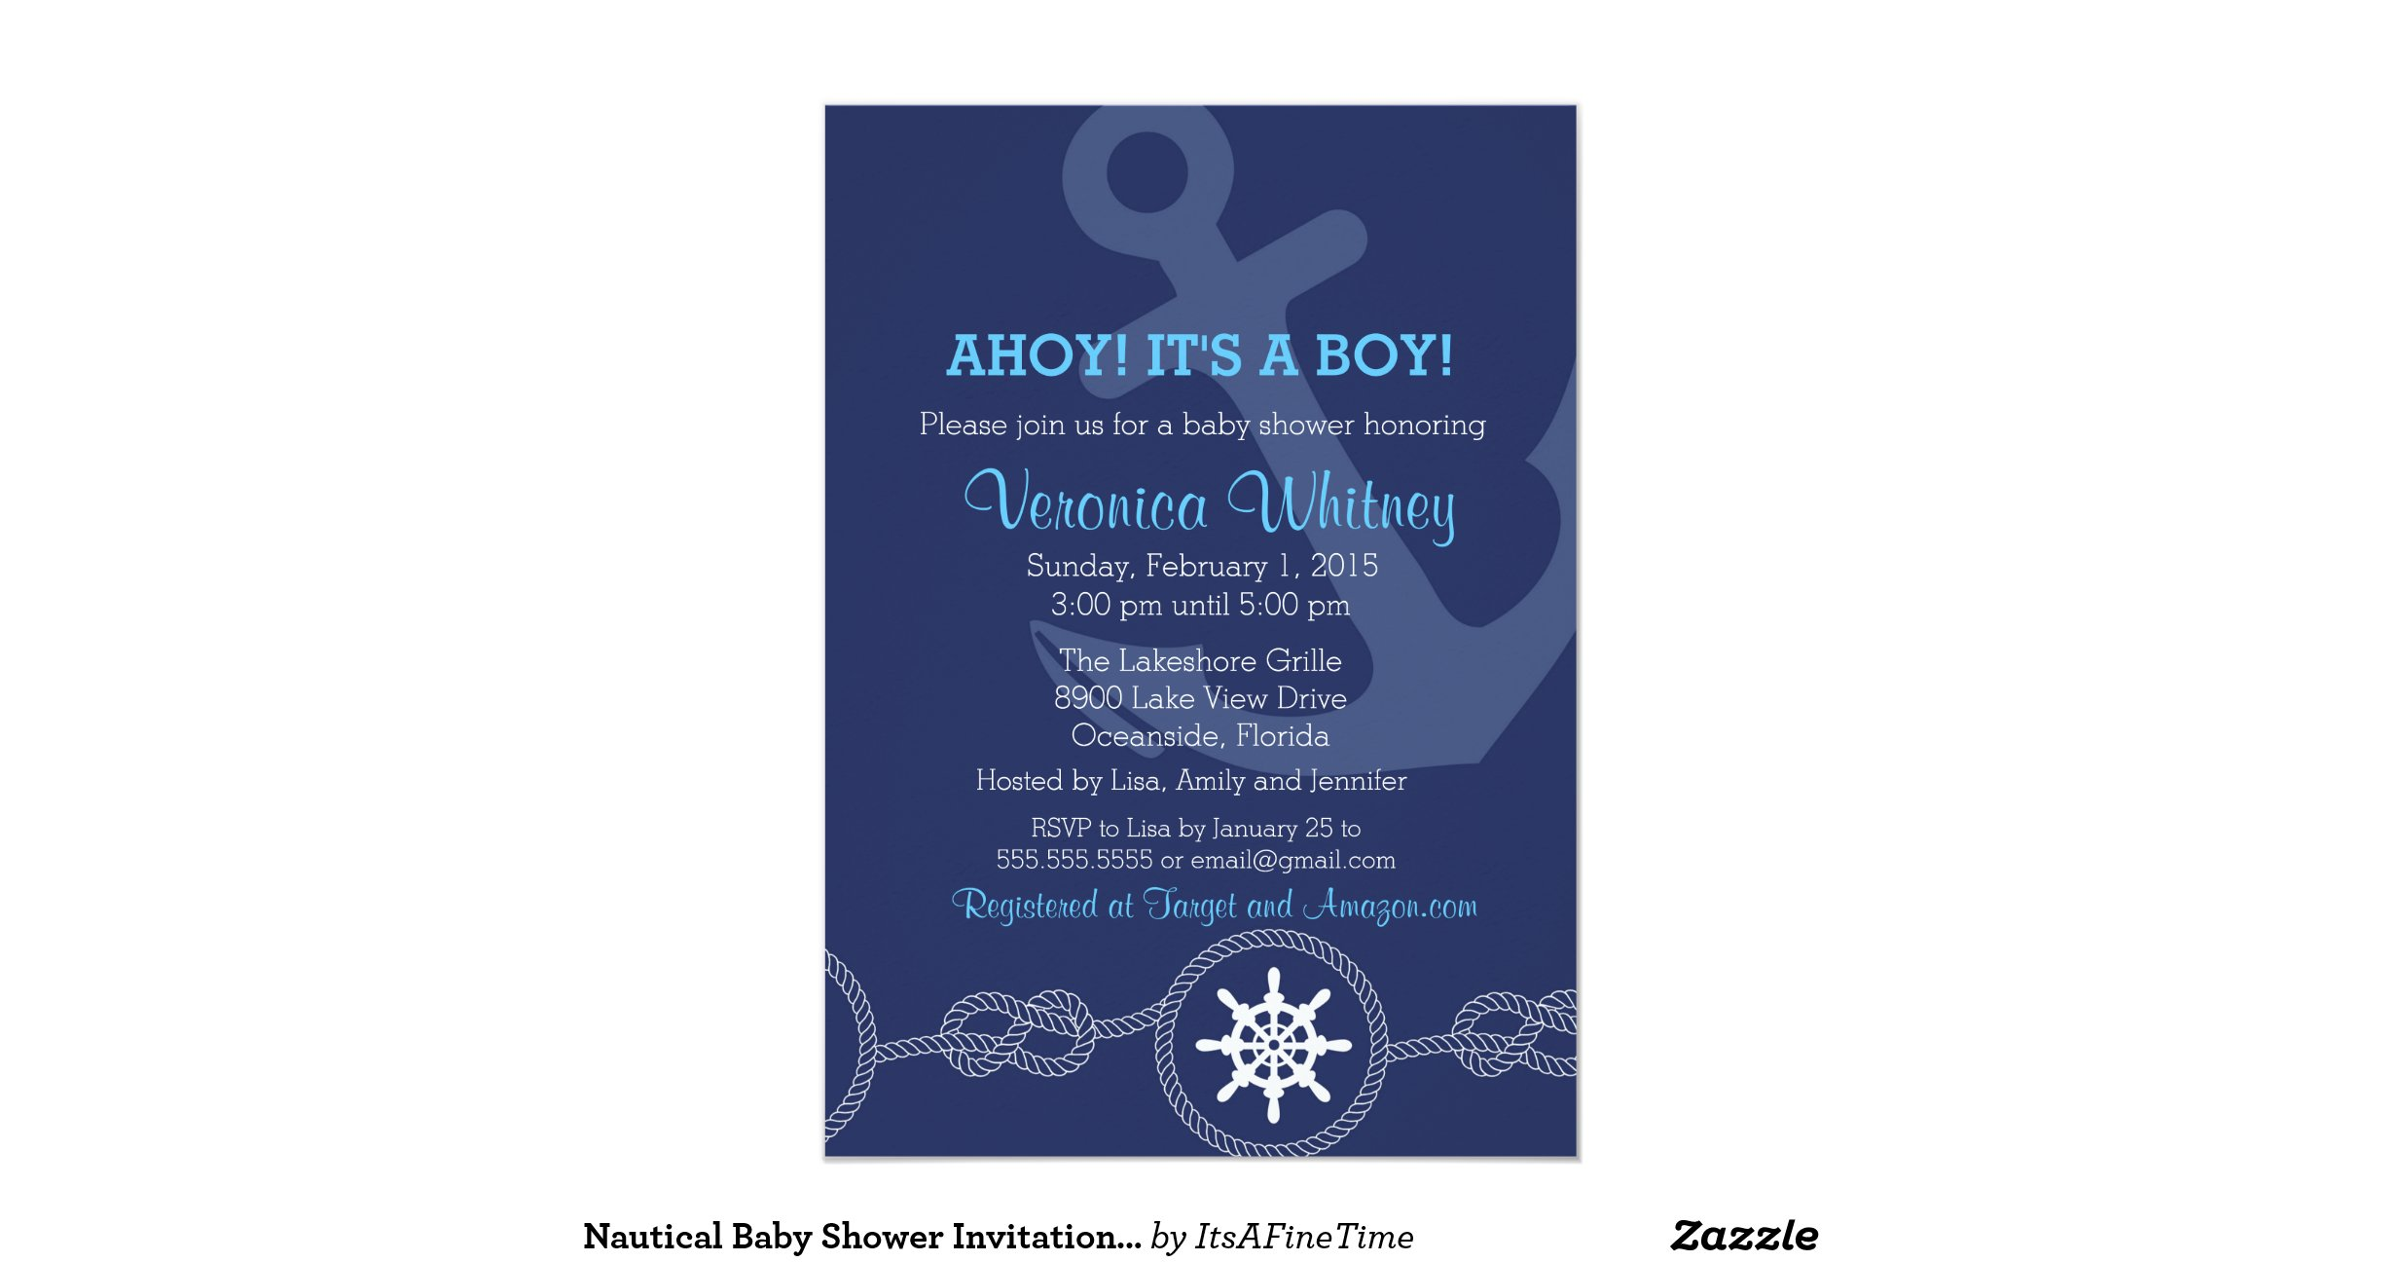 nautical baby shower invitation ahoy its a boy 5 x 7 invitatio